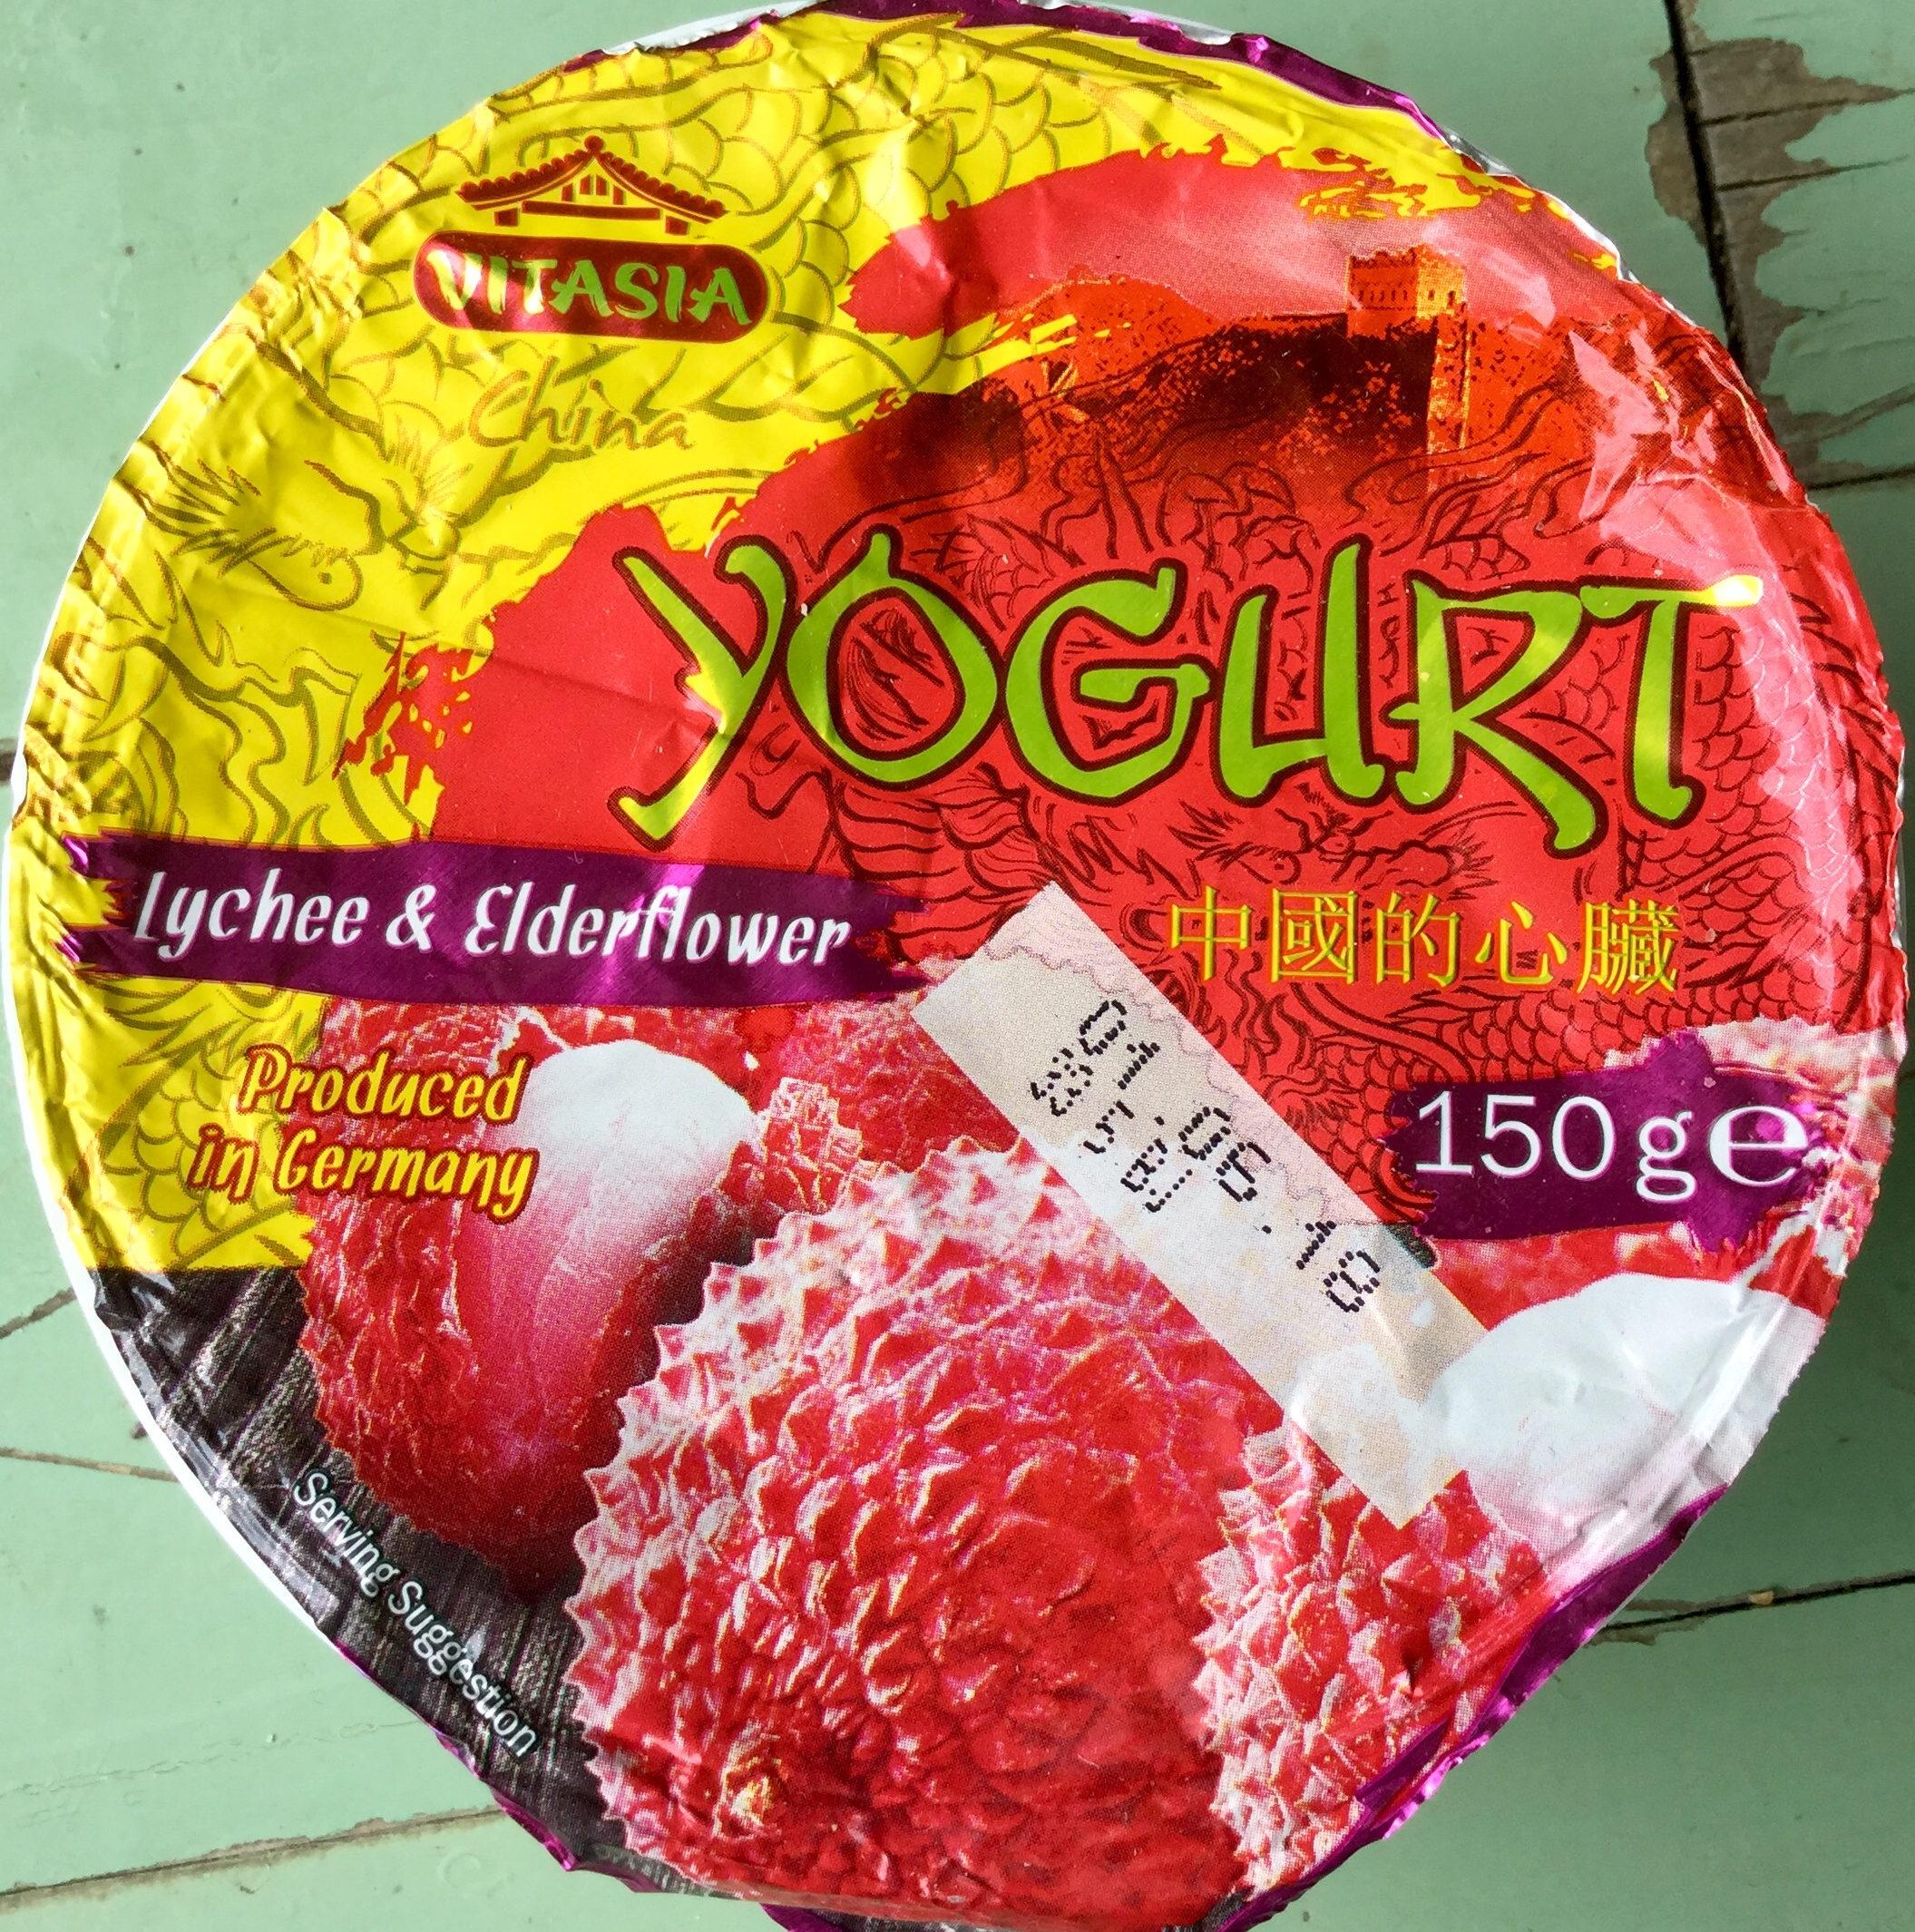 Yogurt - lychee & elderflower - Produit